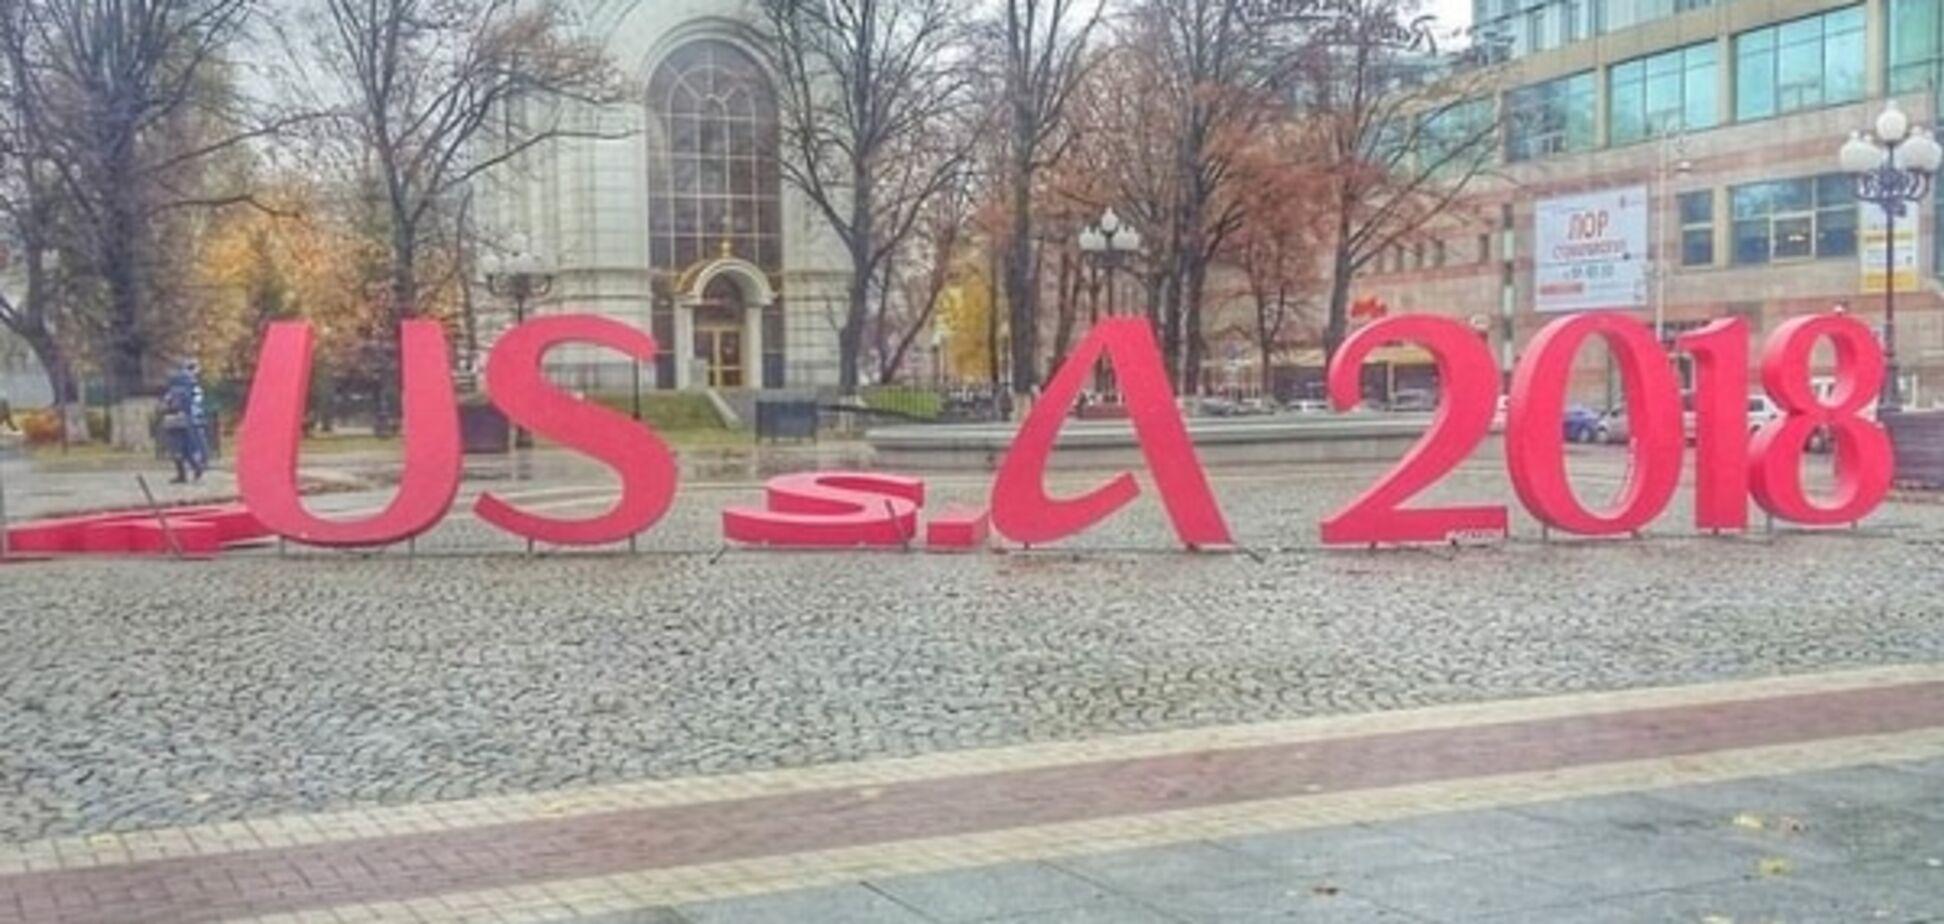 Даже природа троллит: в Калининграде ветер превратил 'Russia' в 'USA'. Фотофакт